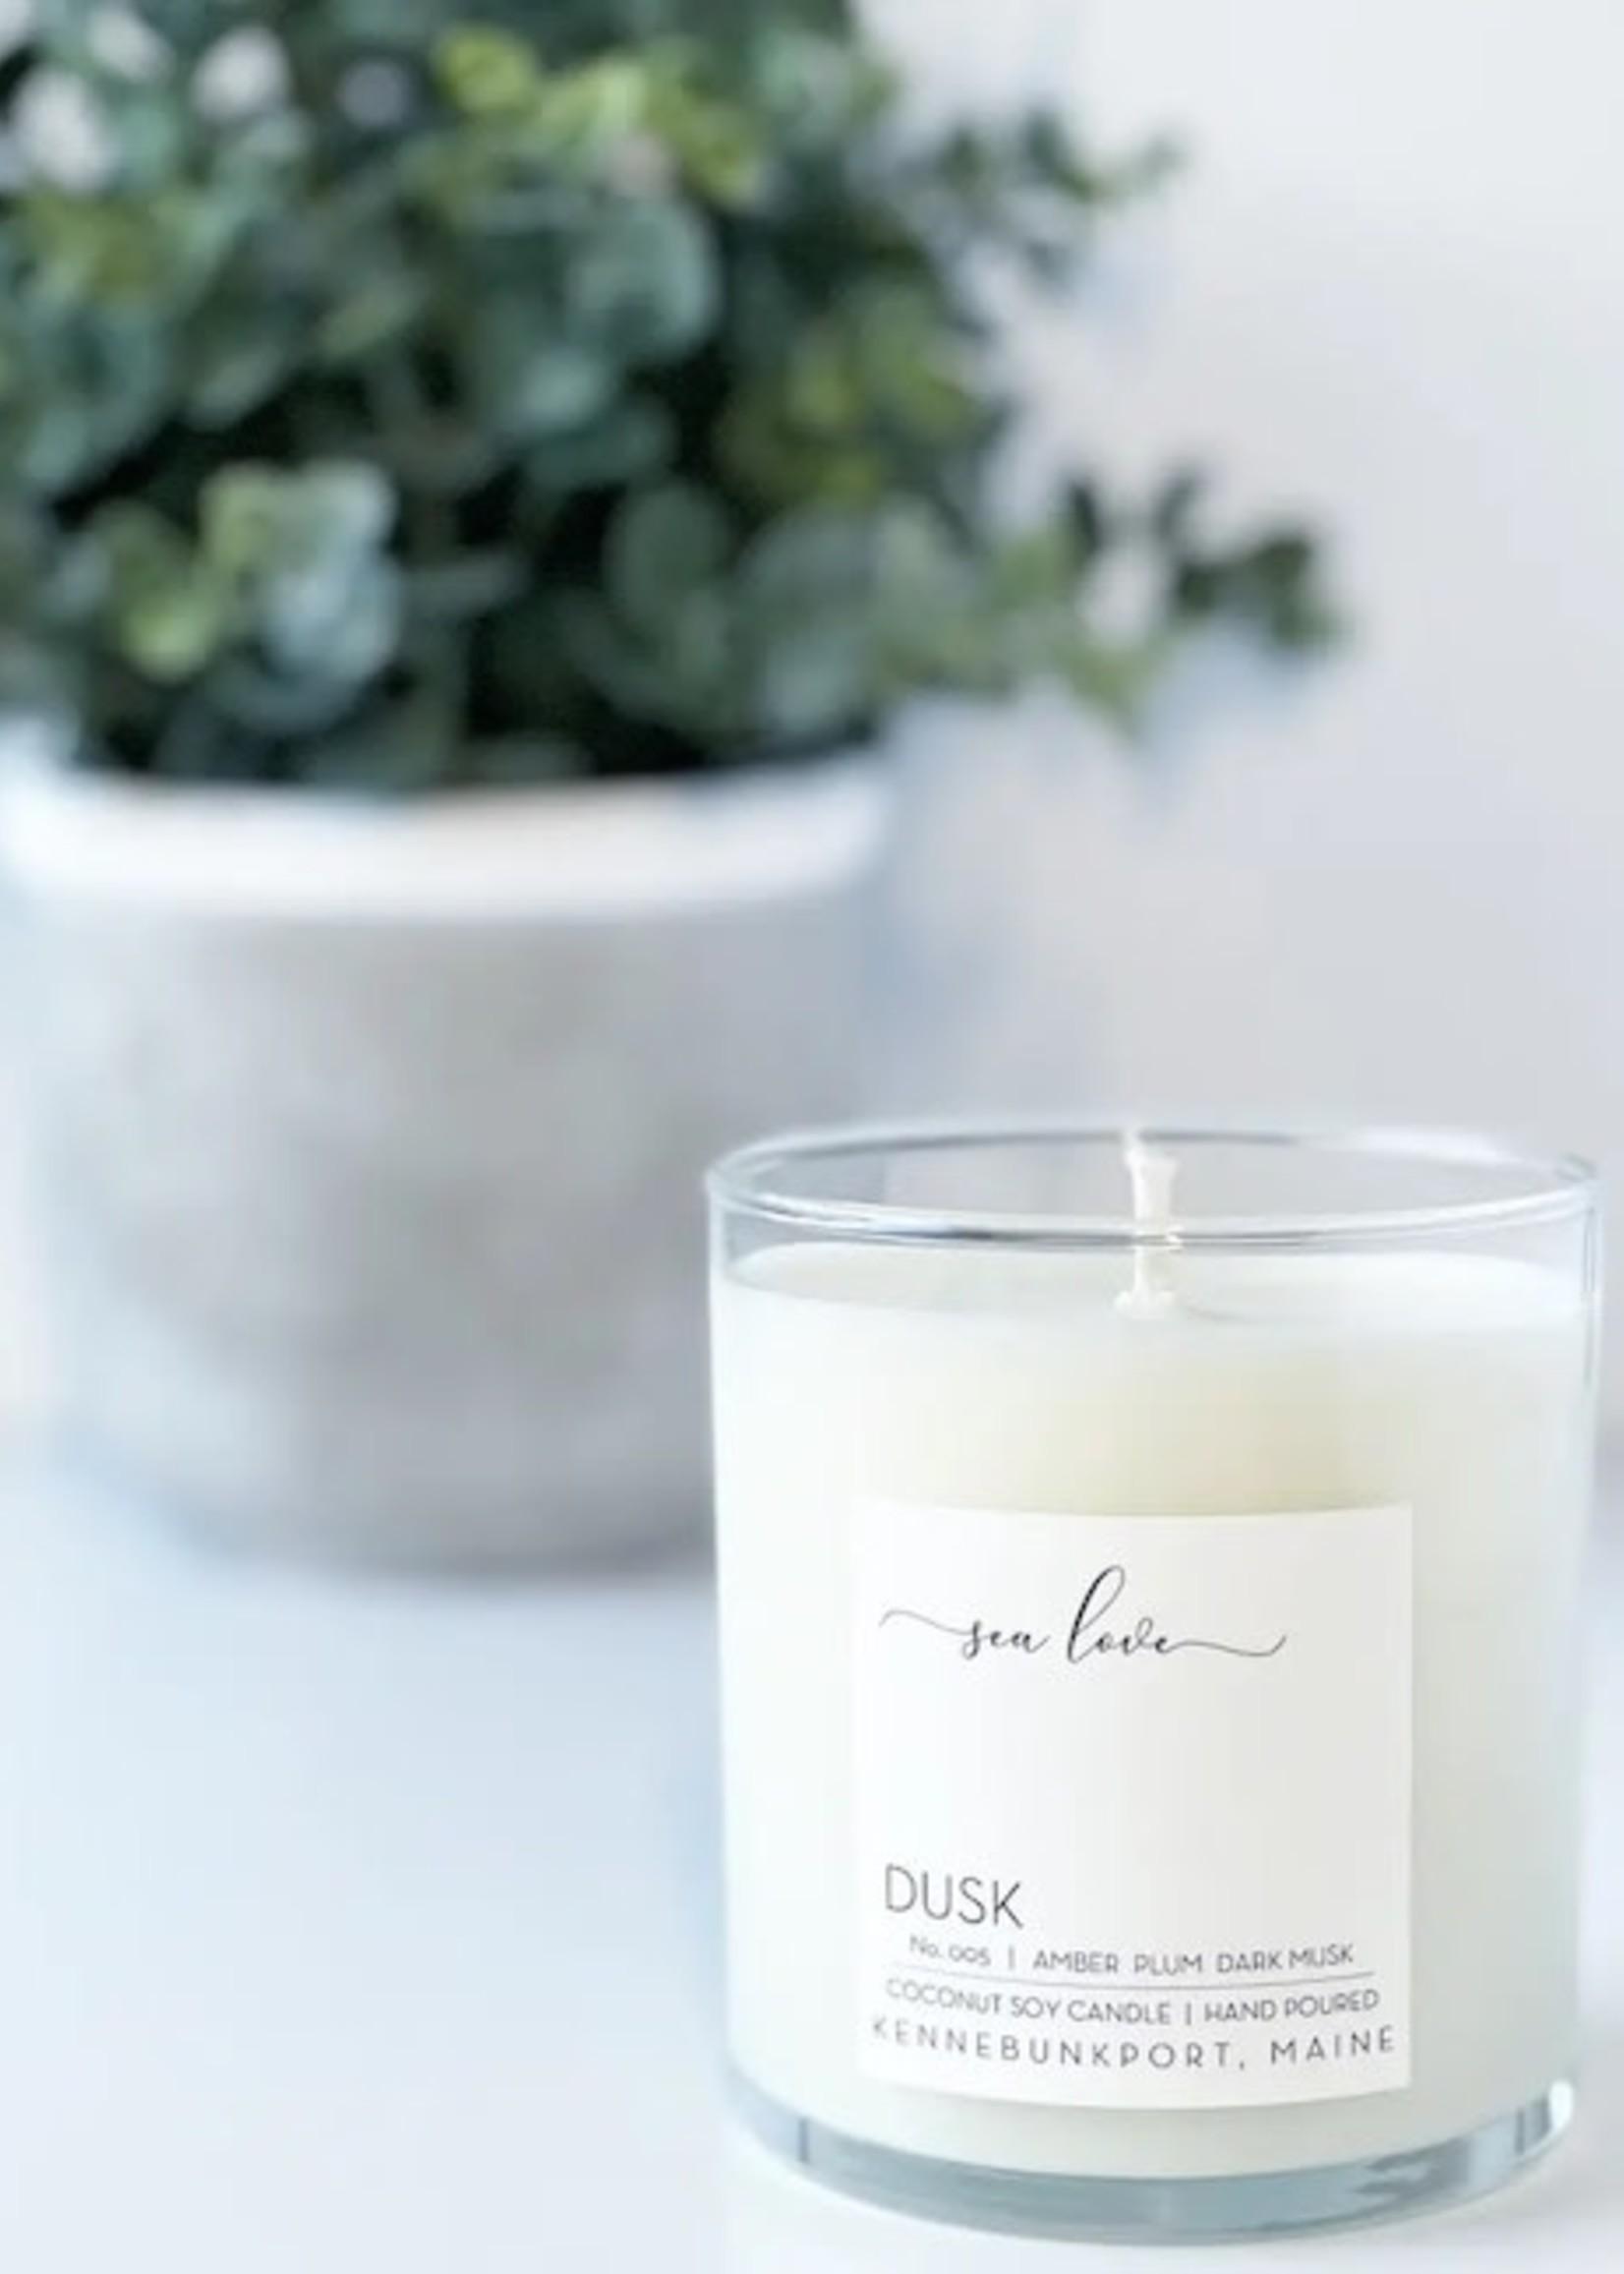 Sea Love Candles Dusk Candle